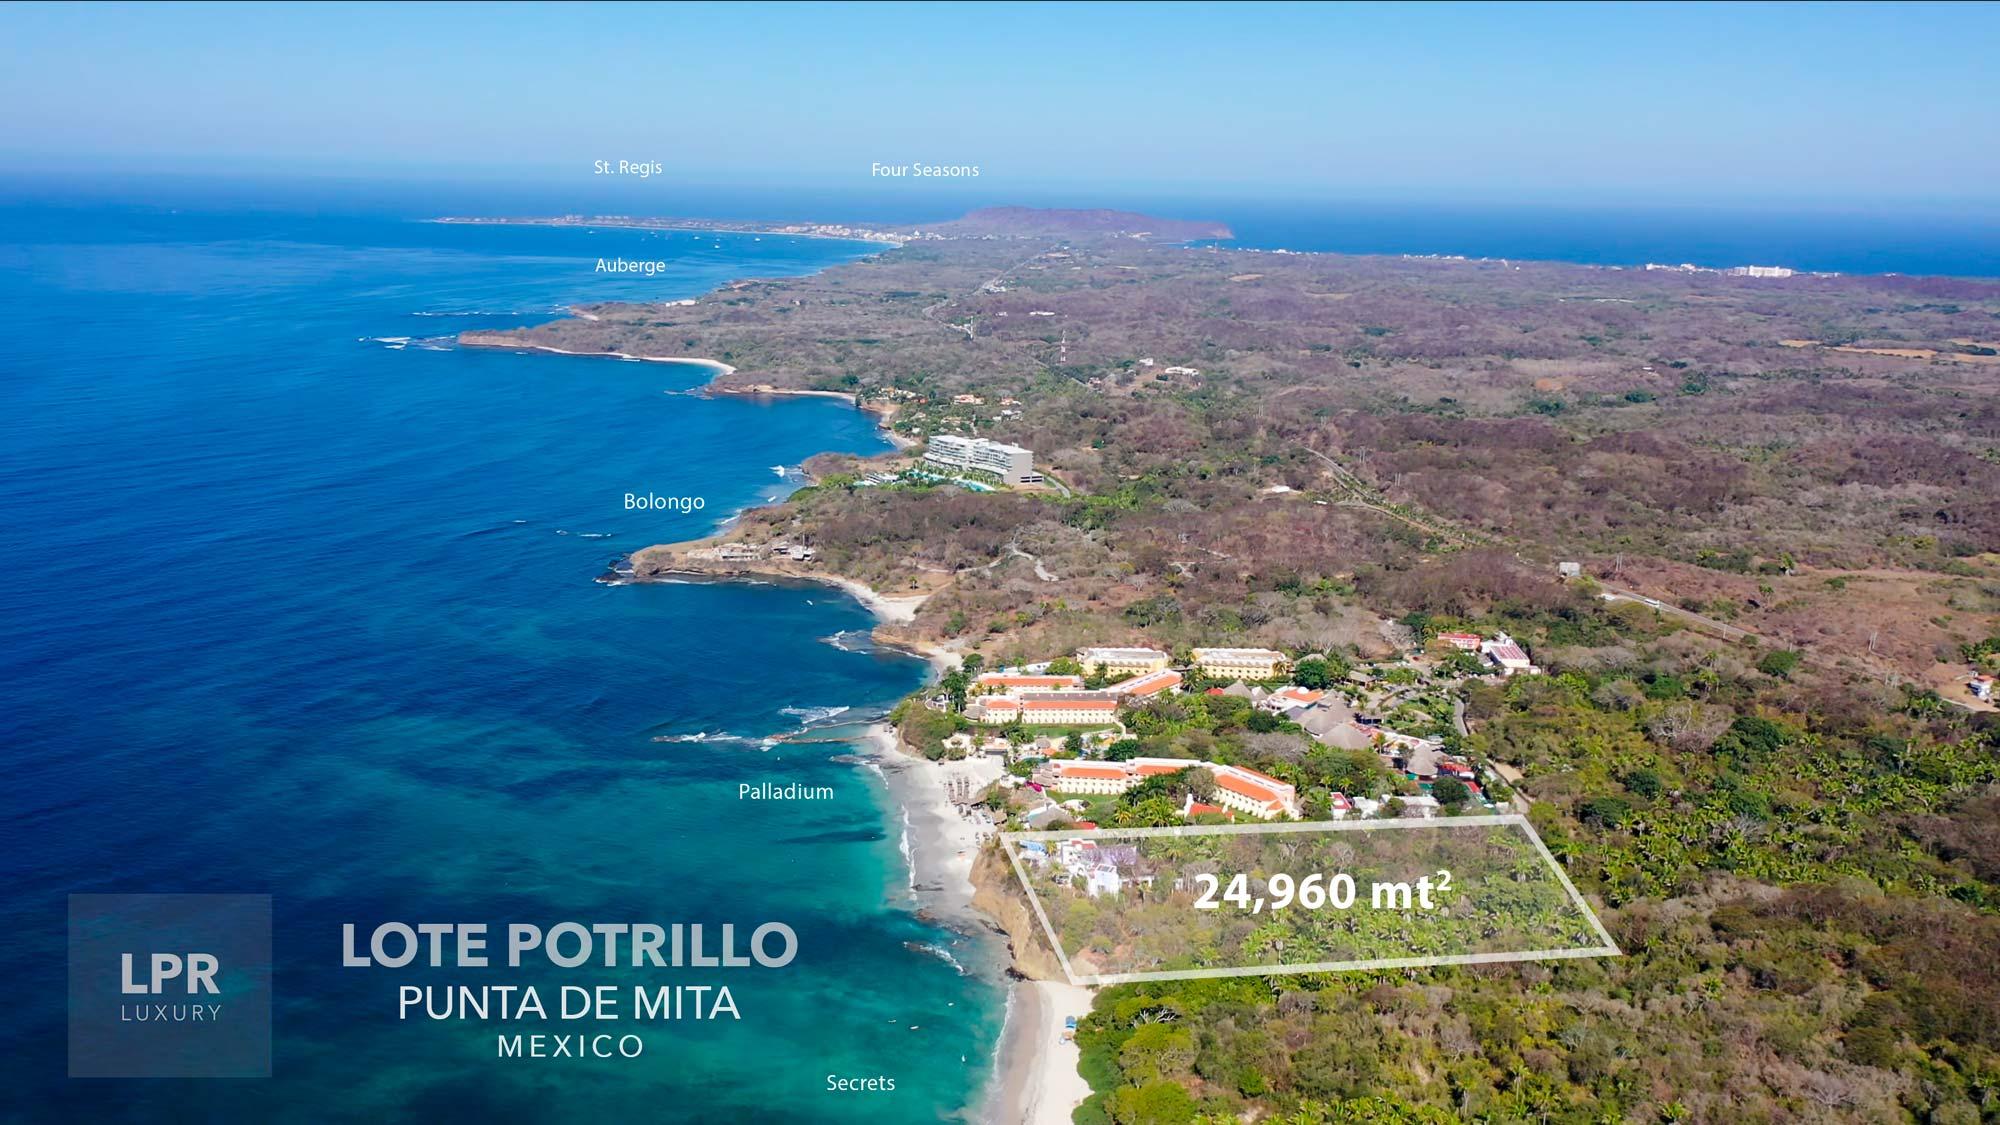 Lote Potrillo - Punta de Mita, Riviera Nayarit, Mexico land for sale